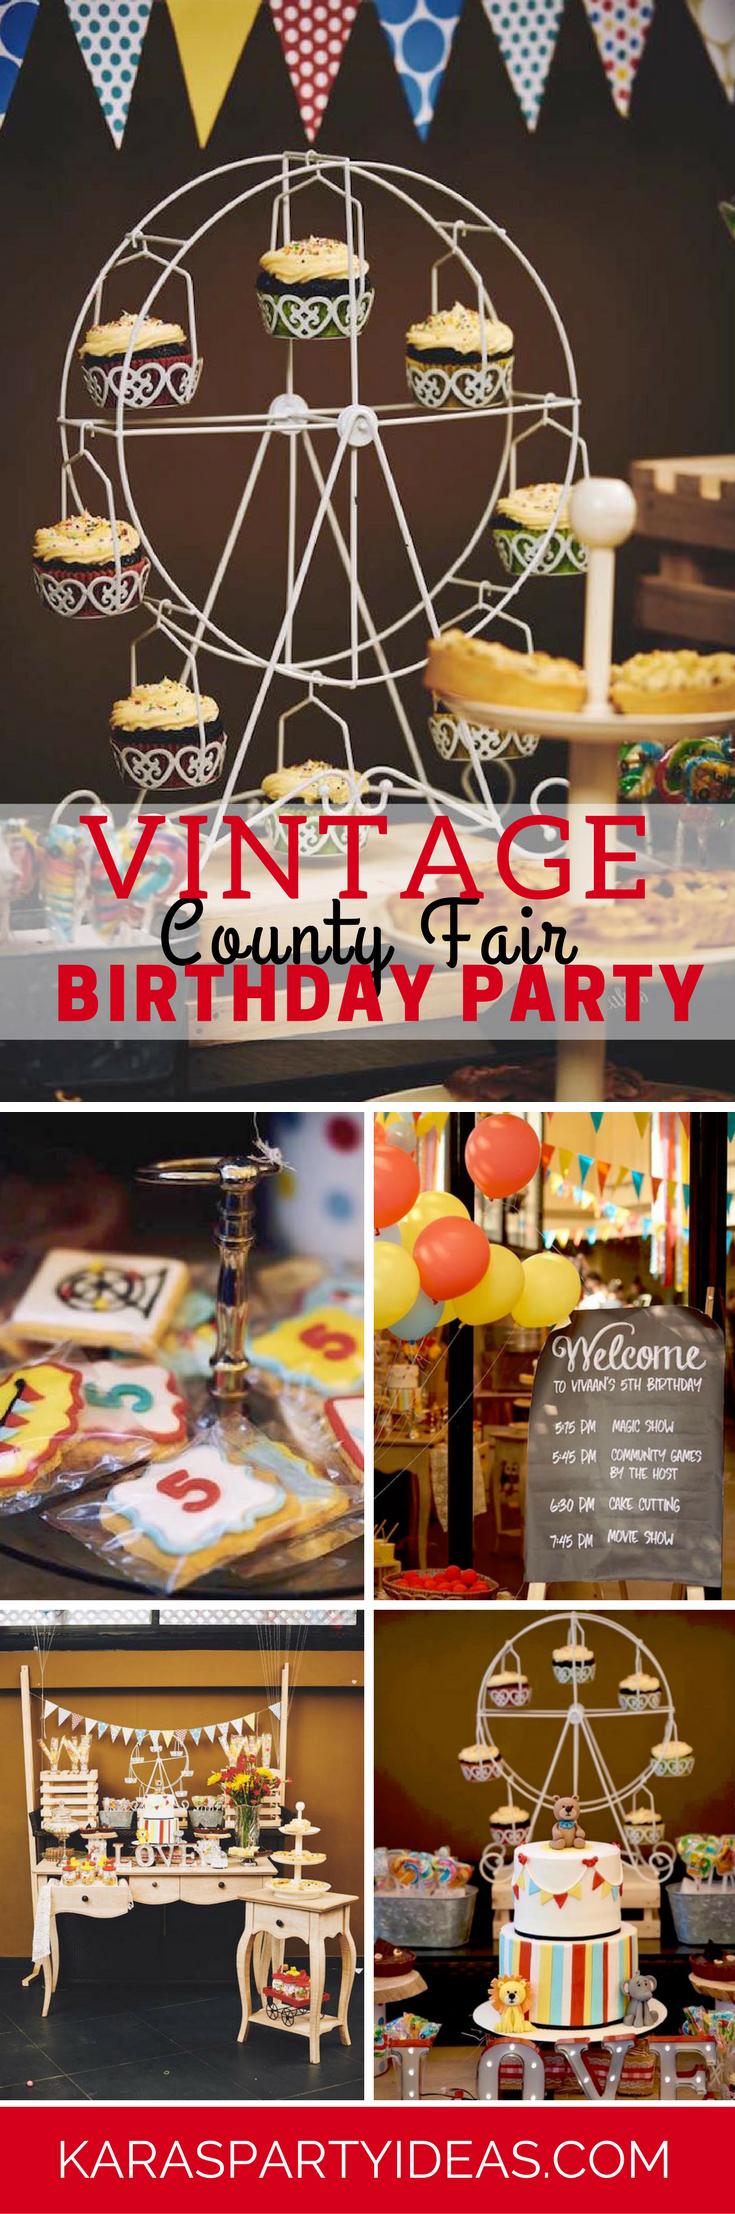 Vintage County Fair Birthday Party via Kara's Party Ideas - KarasPartyIdeas.com